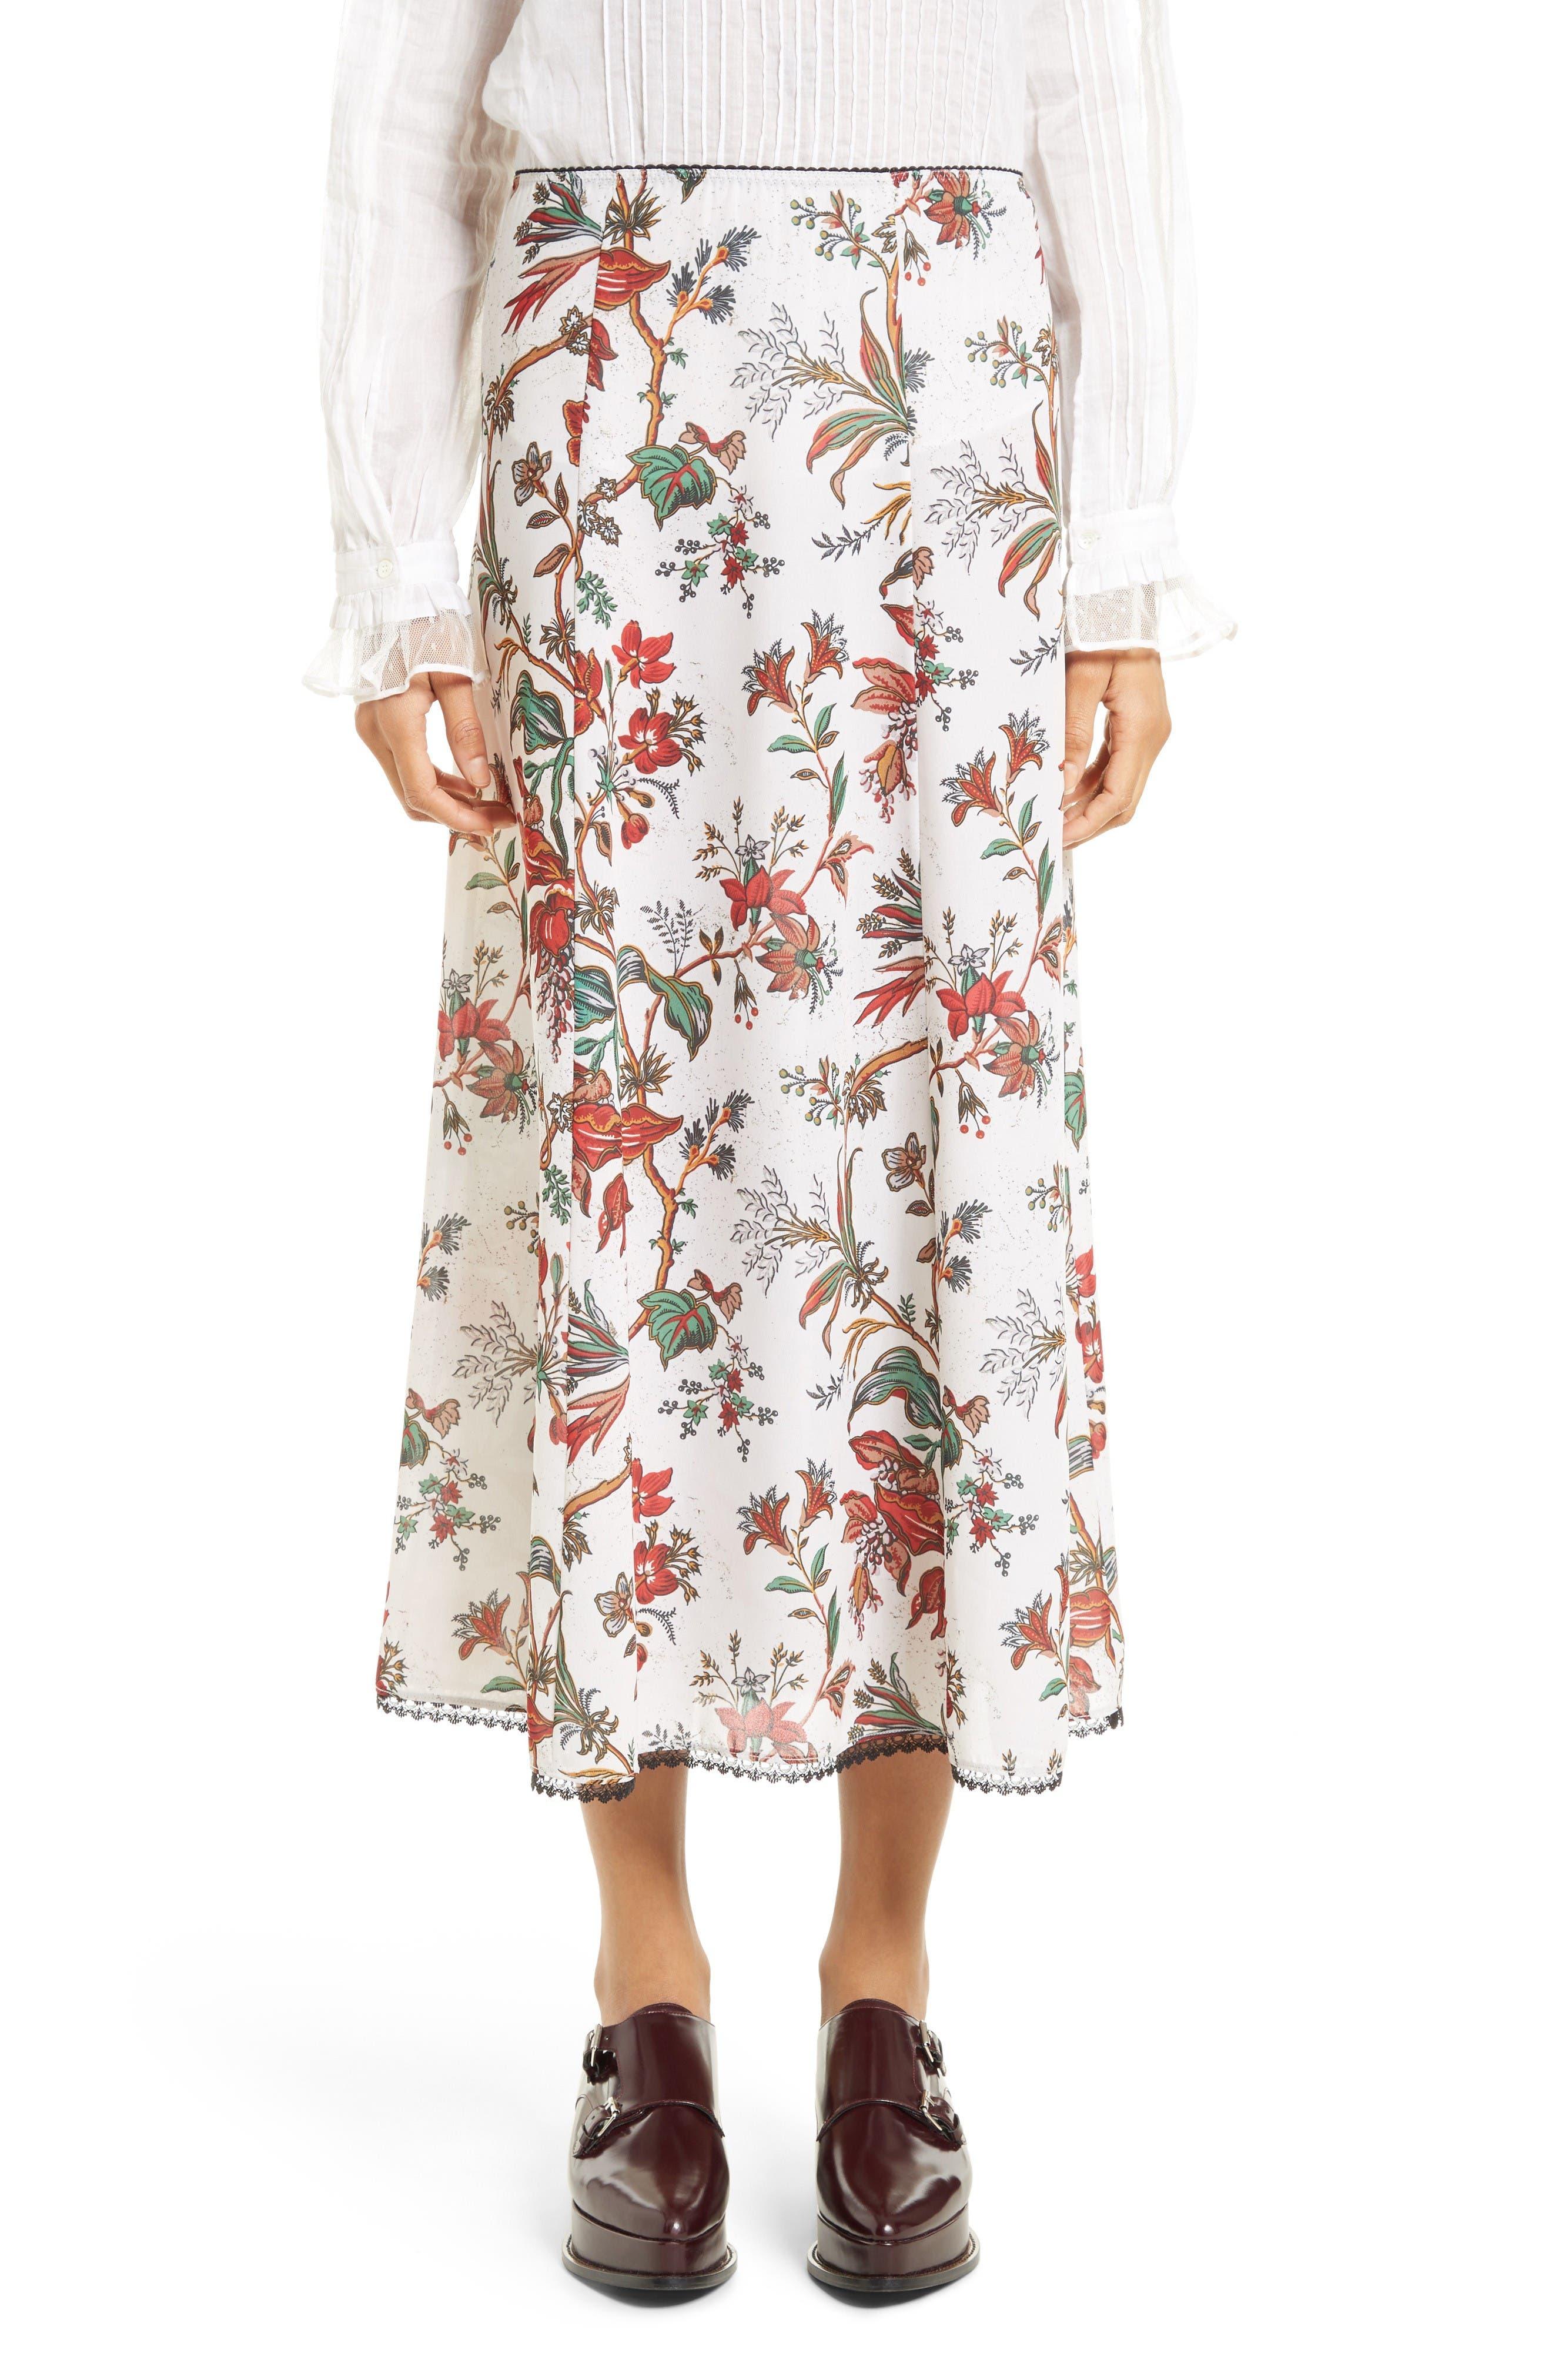 Main Image - McQ Alexander McQueen Floral Print Skirt